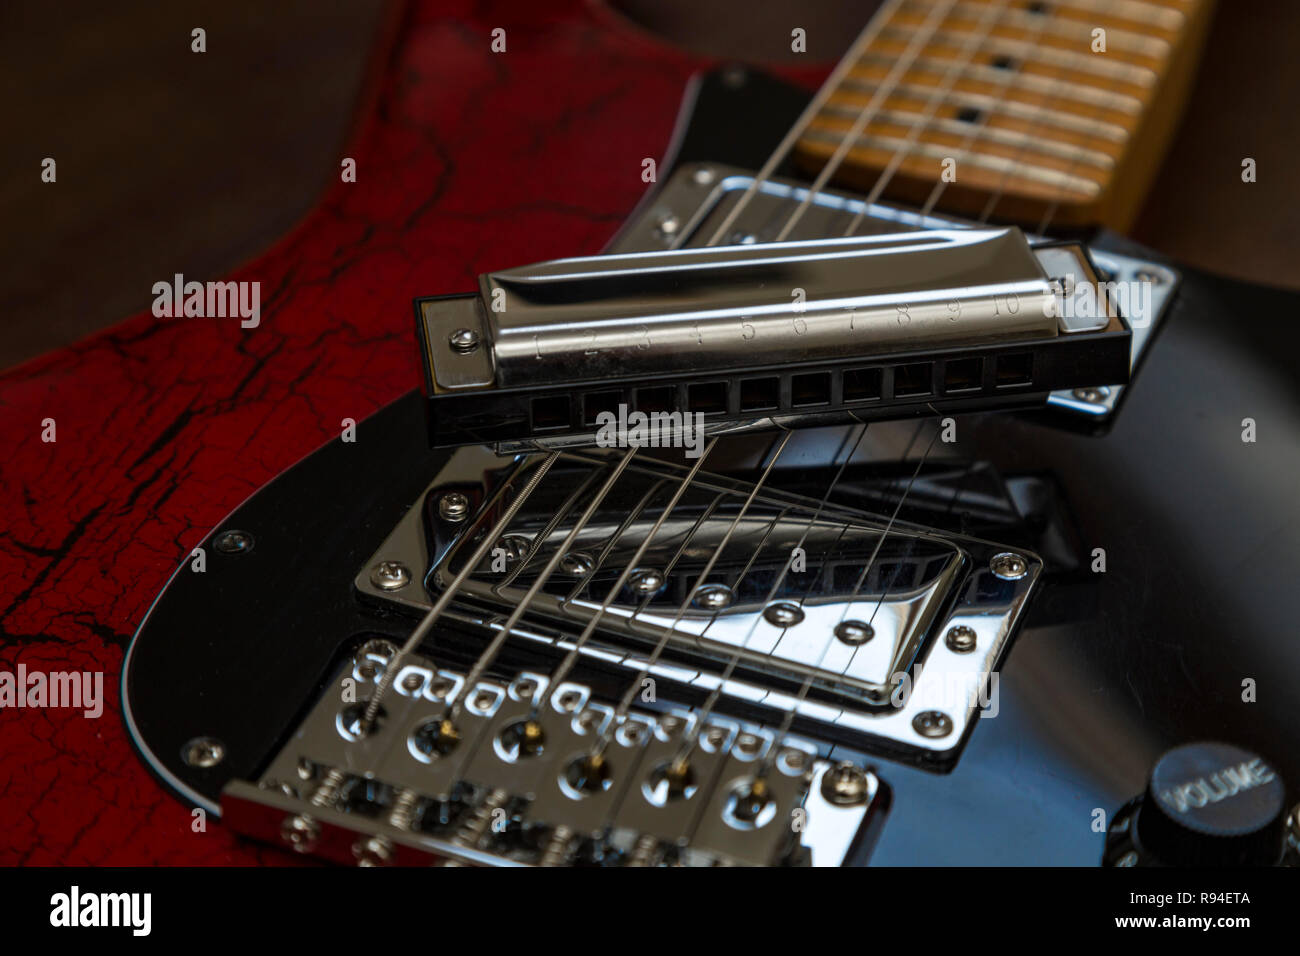 Harrmonica en una vieja guitarra eléctrica. Blues, Rock, Música Imagen De Stock